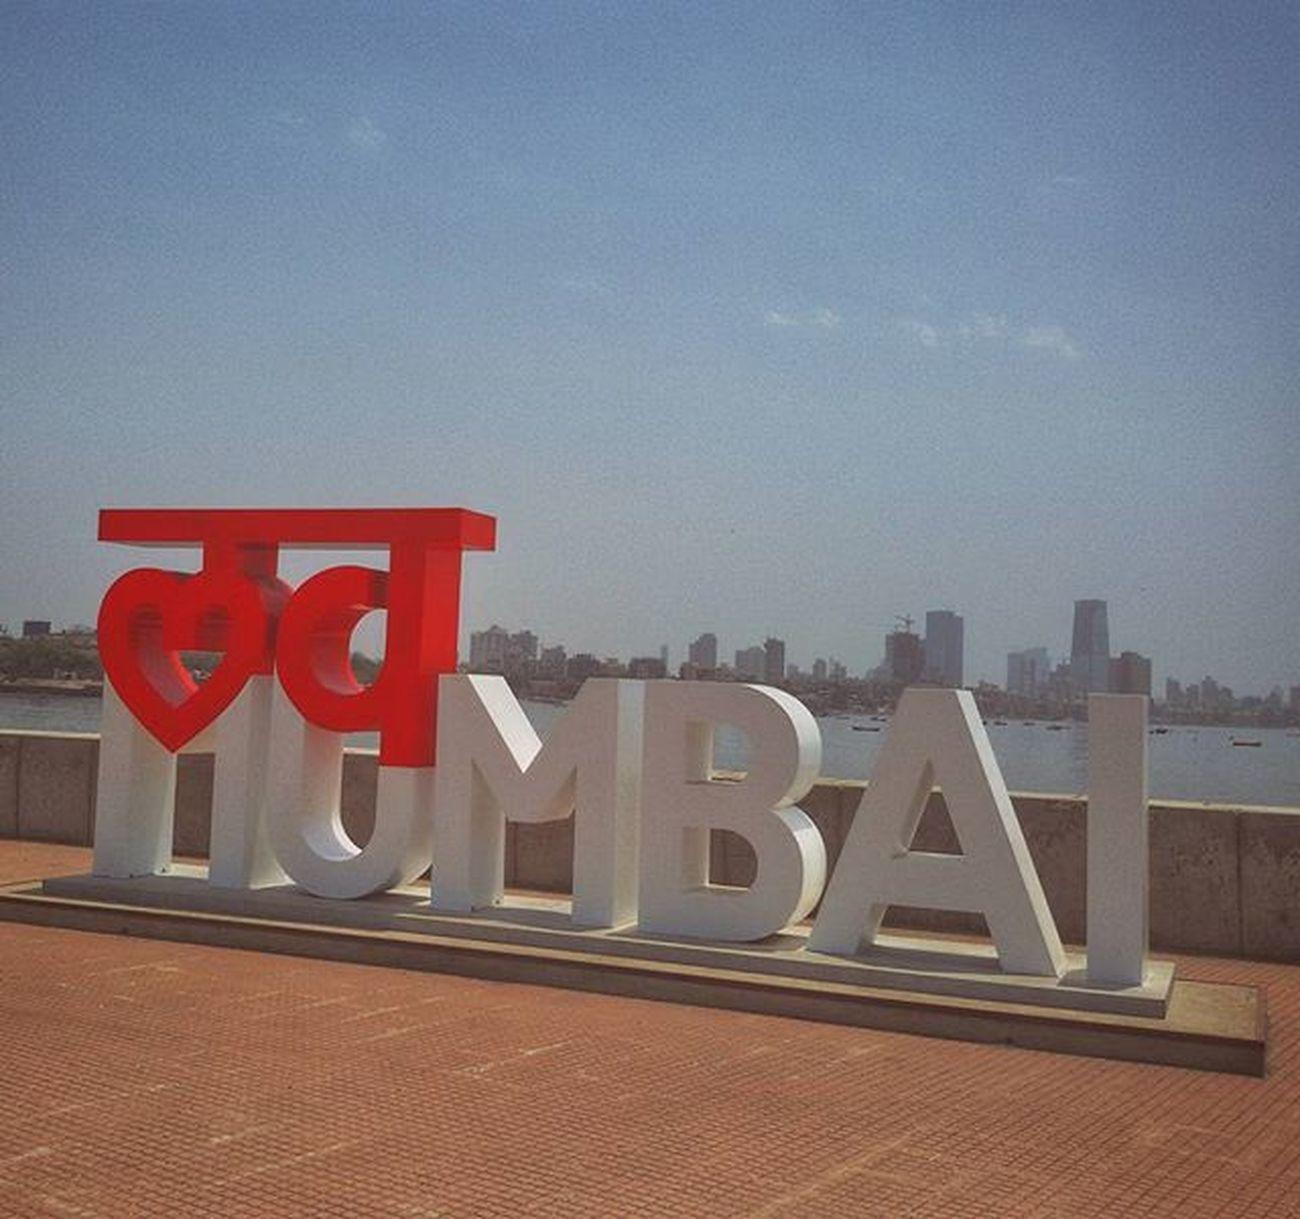 @love.mumbai @asianpaints @things2doinmumbai @mumbai_igers @itz_mumbai @streets.of.mumbai @mumbai_uncensored @mumbai_explorer @my.mumbai @mumbaibizarre @mumbai_stories @photography_club_of_mumbai @things2doinmumbai @mumbai_igers @mobile_hdr @photographers_of_india @indiashutterbugs @india_ig @all.about.india @ohmyindia @inspiroindia @indiadiscovery @mblgrphy @phodus_competition @india.clicks @clickindiaclick Mumbai Maharshtra India Mobilephotography PhonePhotography Indian Indianphoto CameraMan Phonephoto Mobilecameraclub Mobile_perfection Mobilecamera Samsunggalaxygrand2 Streetphotography Streetphotographyindia Maharashtra_ig Insta_maharashtra Maharashtratourism Indianinstagram Indianphotographers Indianphotographersclub Mumbaikar Mumbai_uncensored Mumbaibizarre Mymumbai phodus mumbaimerijaan mumbaidairies ngma inspiroindia phodus